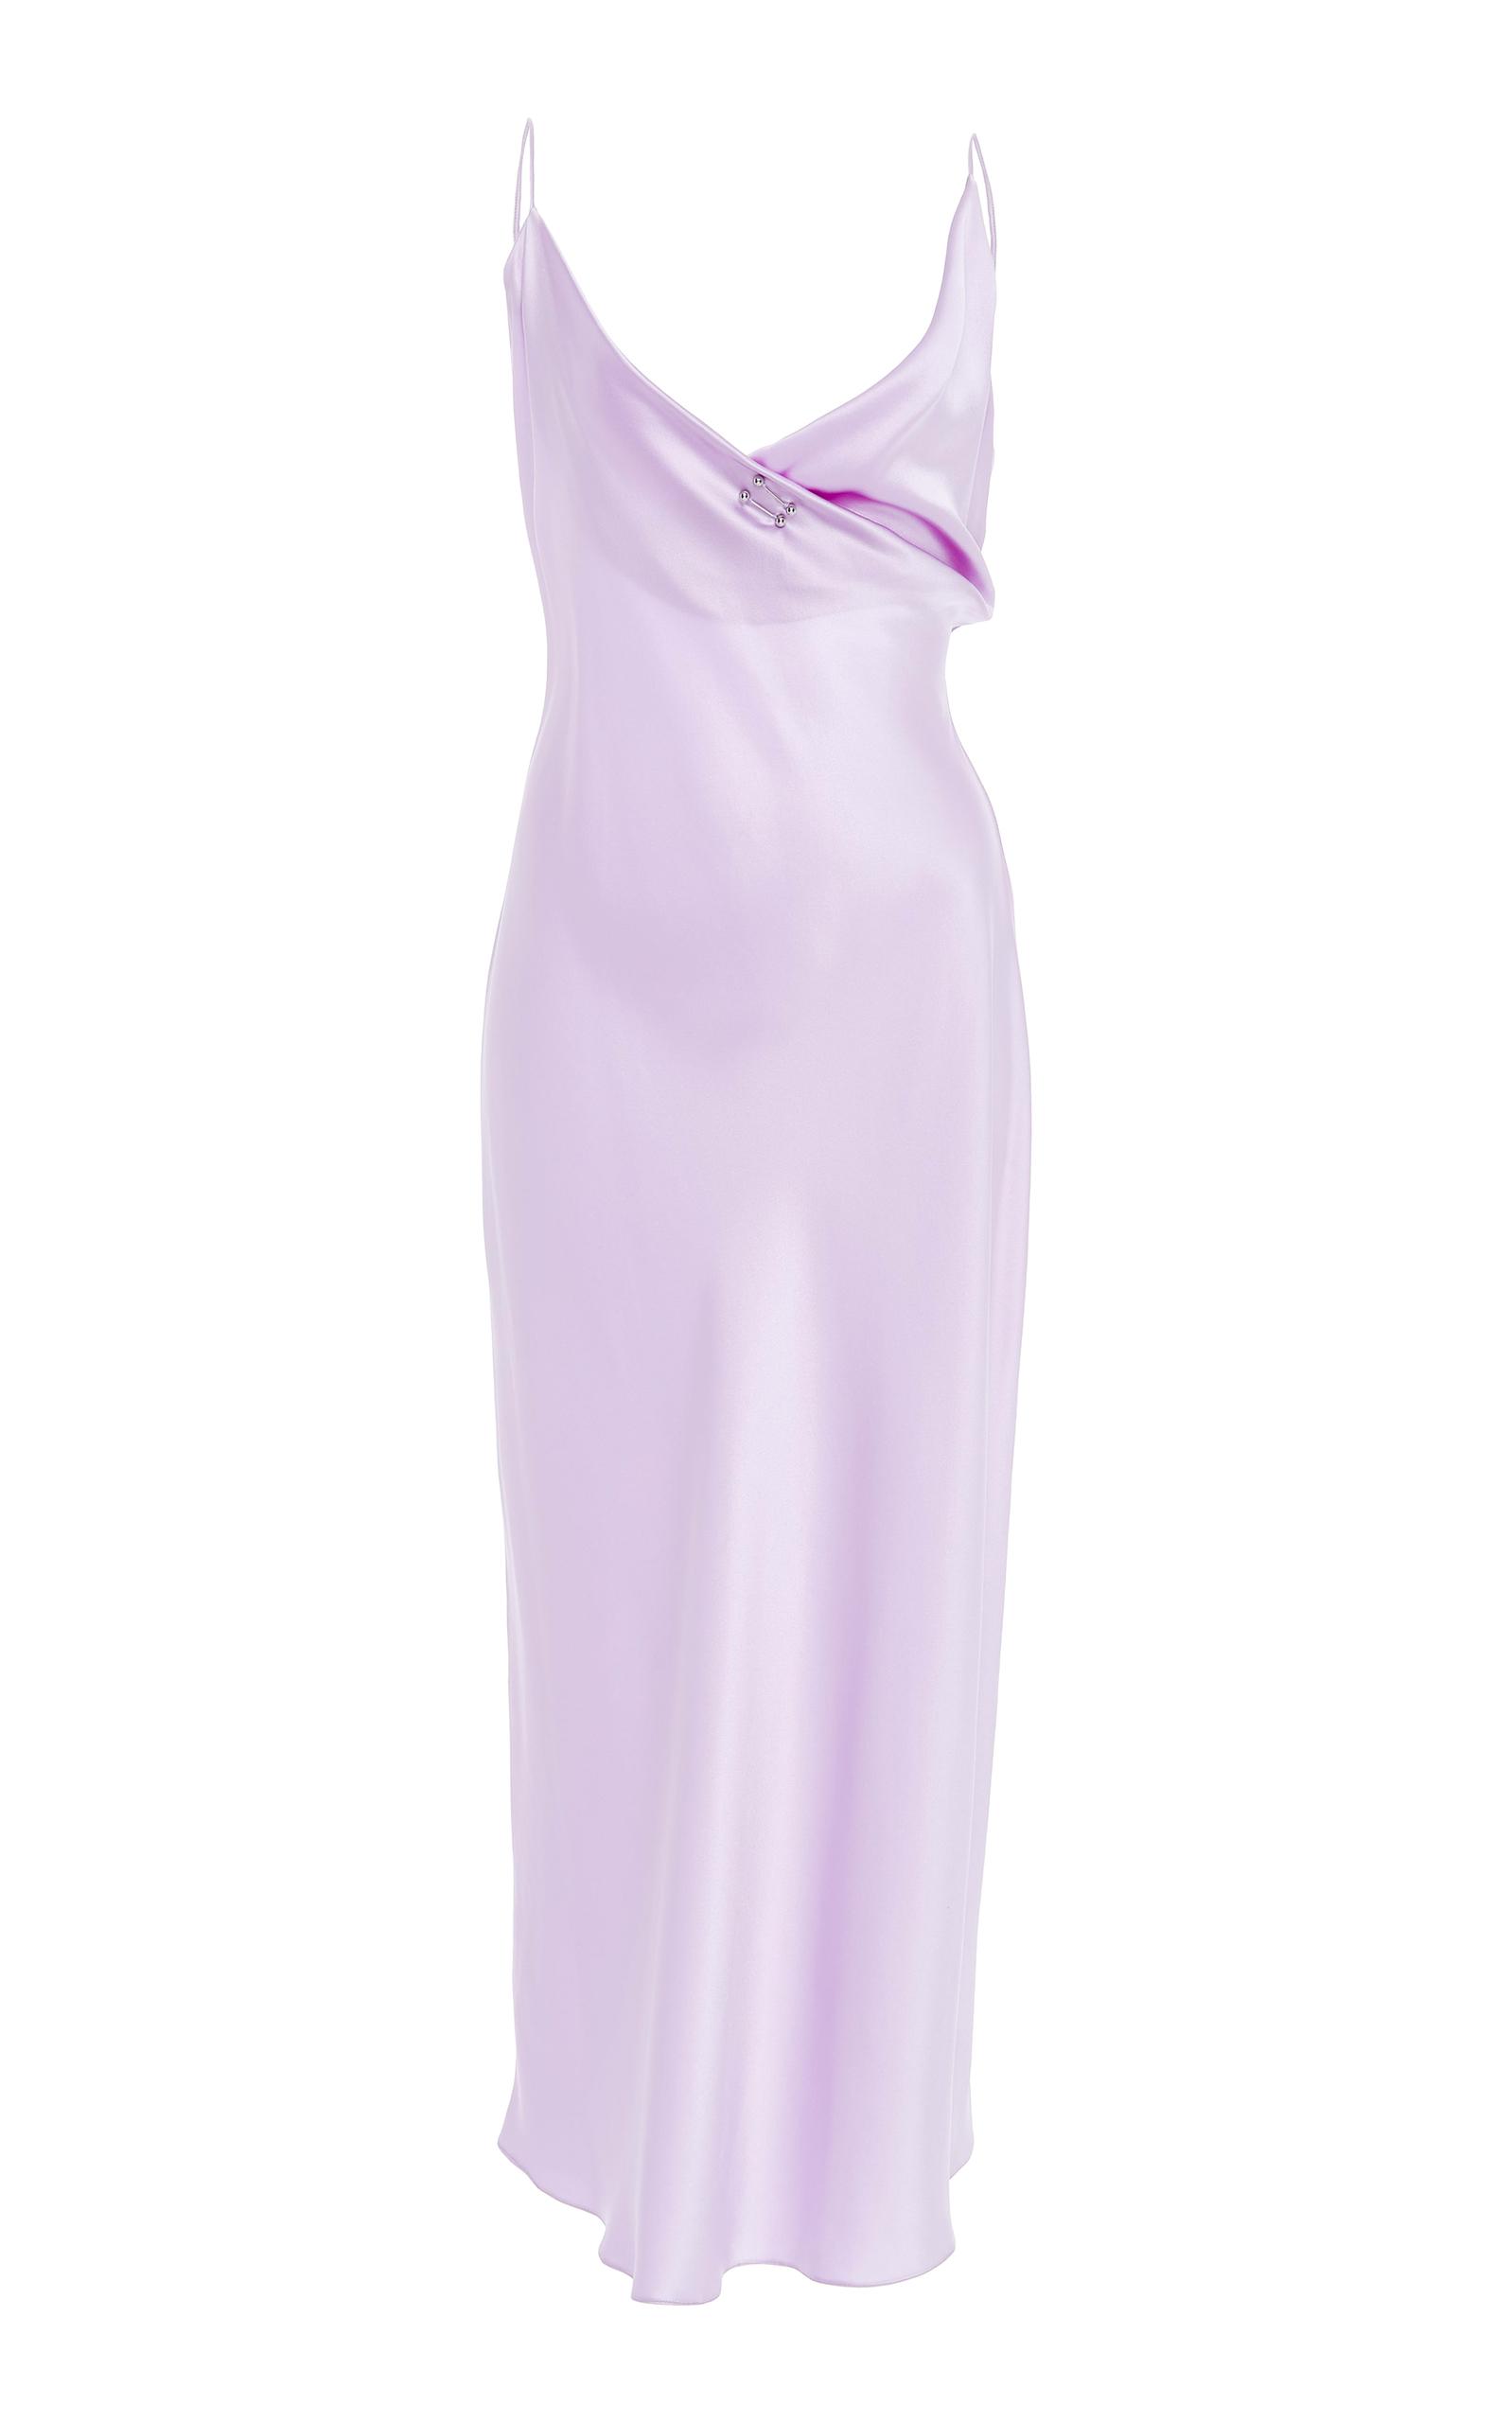 ELEANOR BALFOUR CAMILLE 90S SLIP DRESS